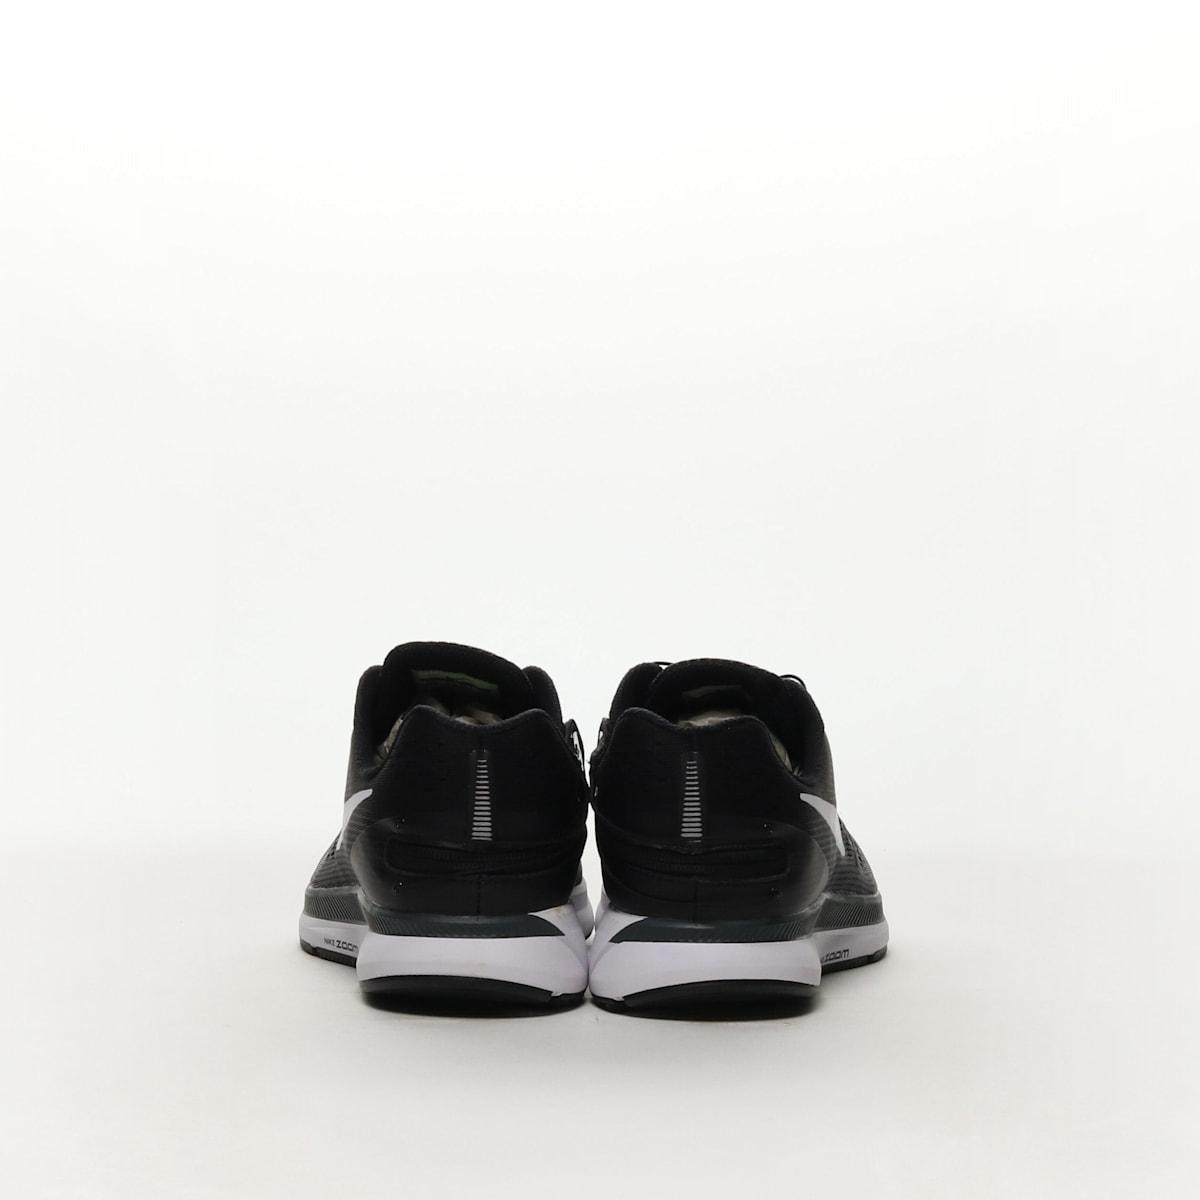 2756fa8729796 Nike Air Zoom Pegasus 34 FlyEase - BLACK DARK GREY ANTHRACITE WHITE ...